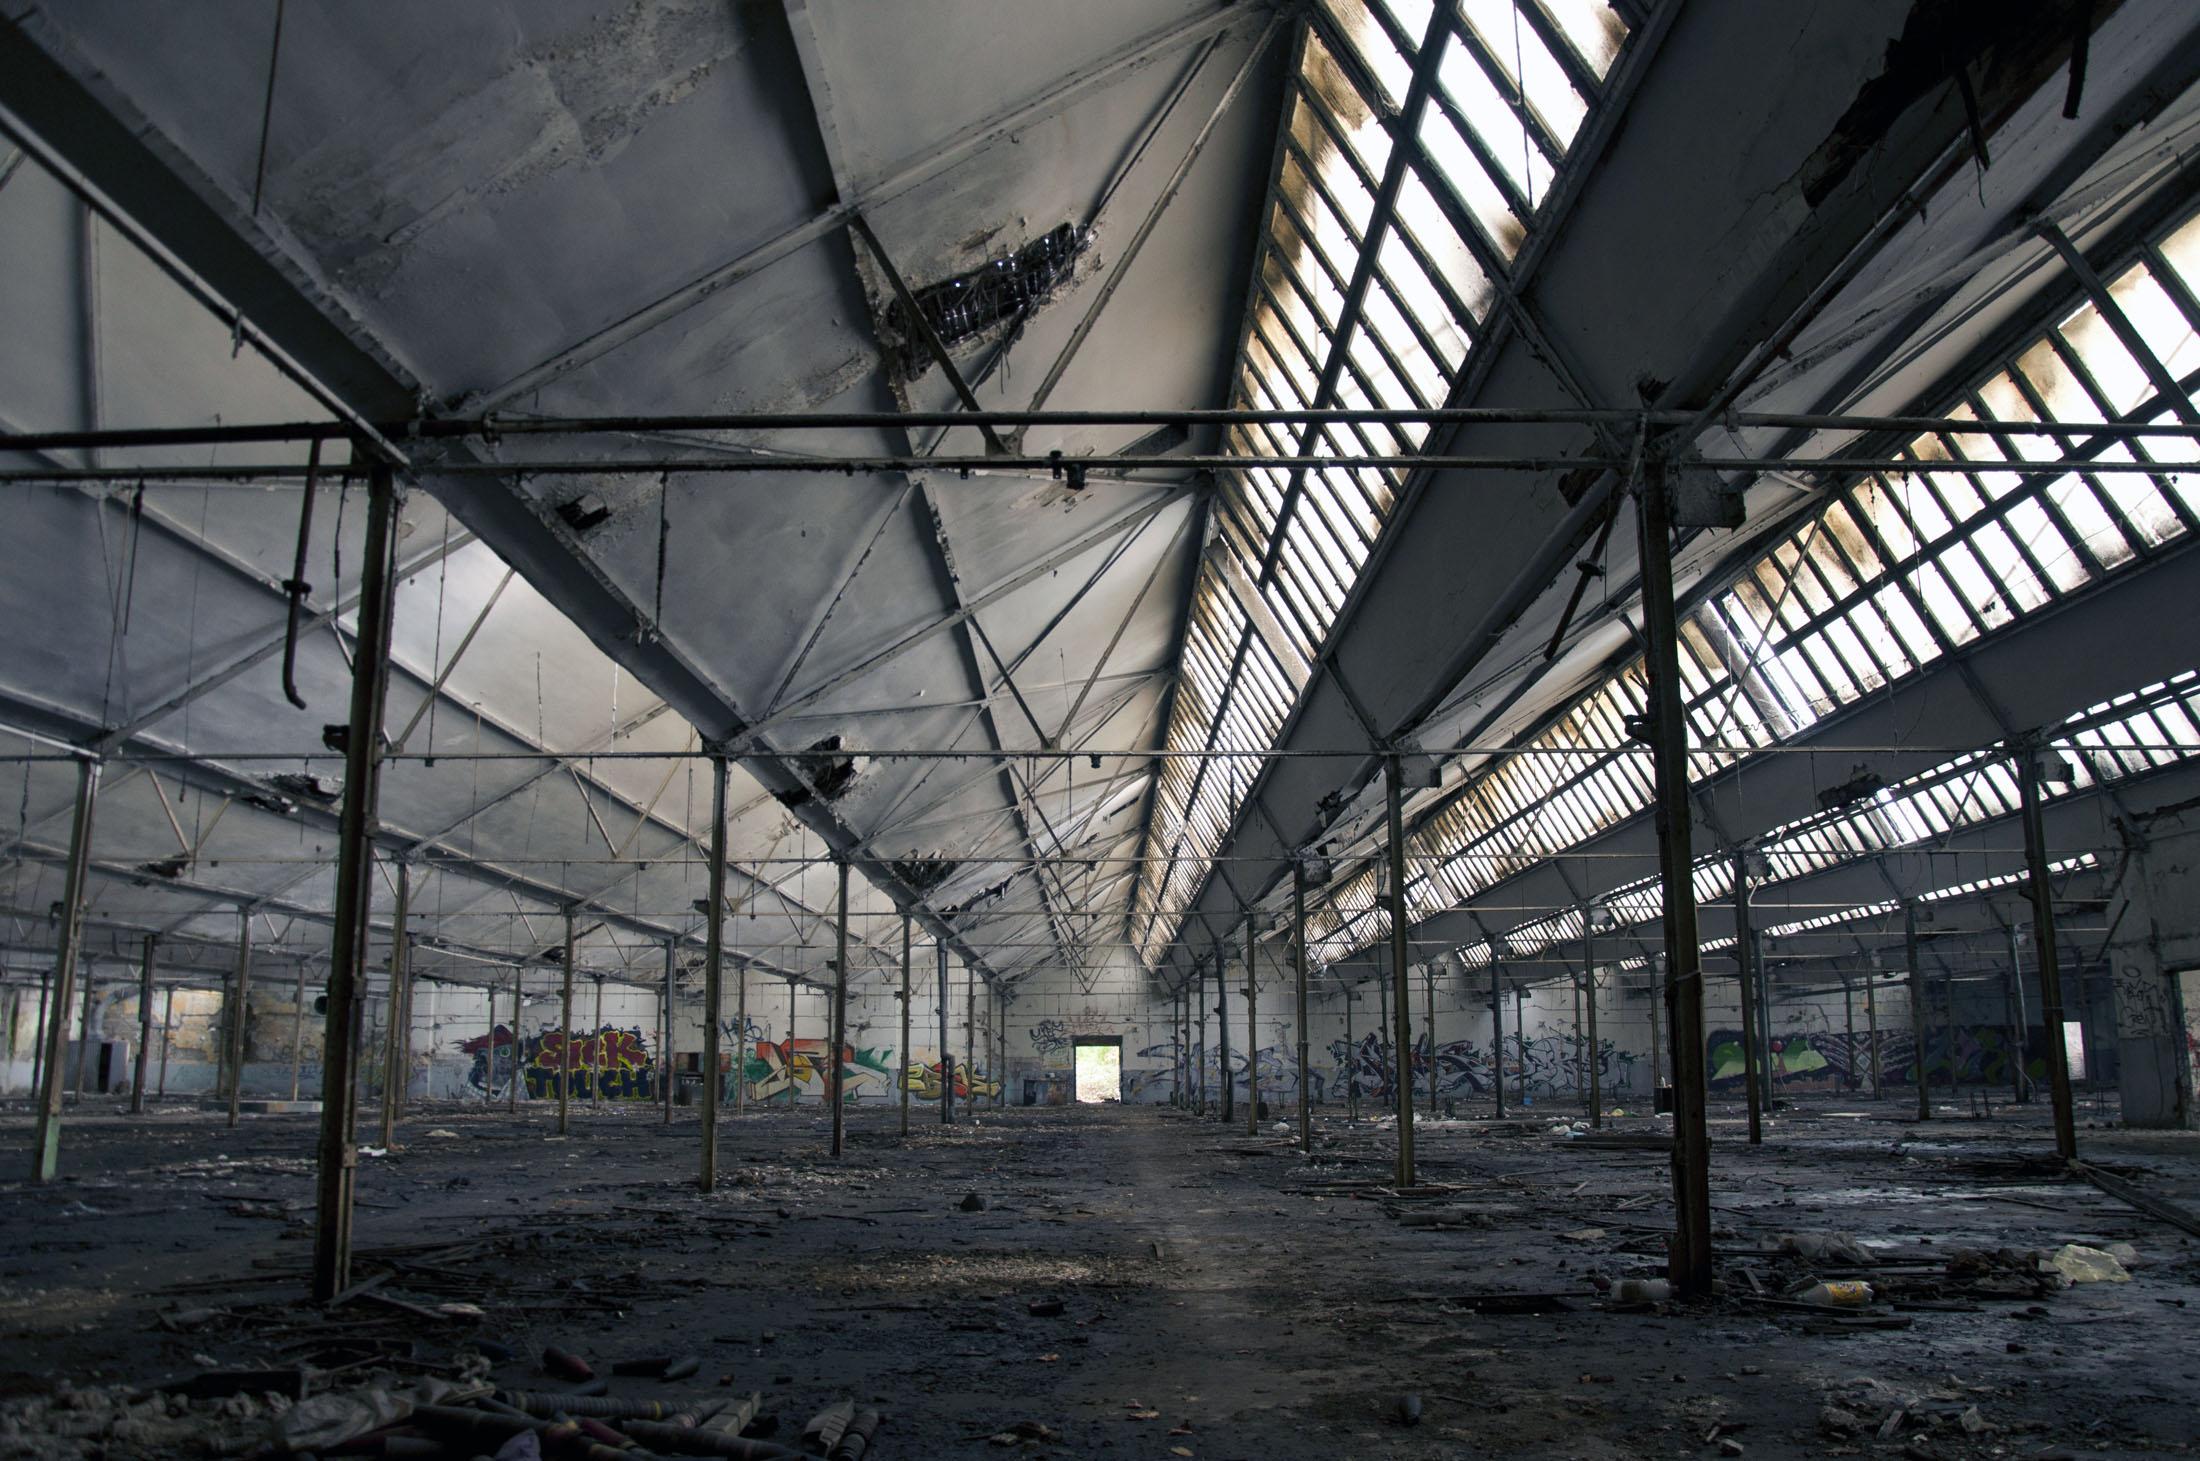 Arhiviranje-Beograda-Sibinovic-10.jpg